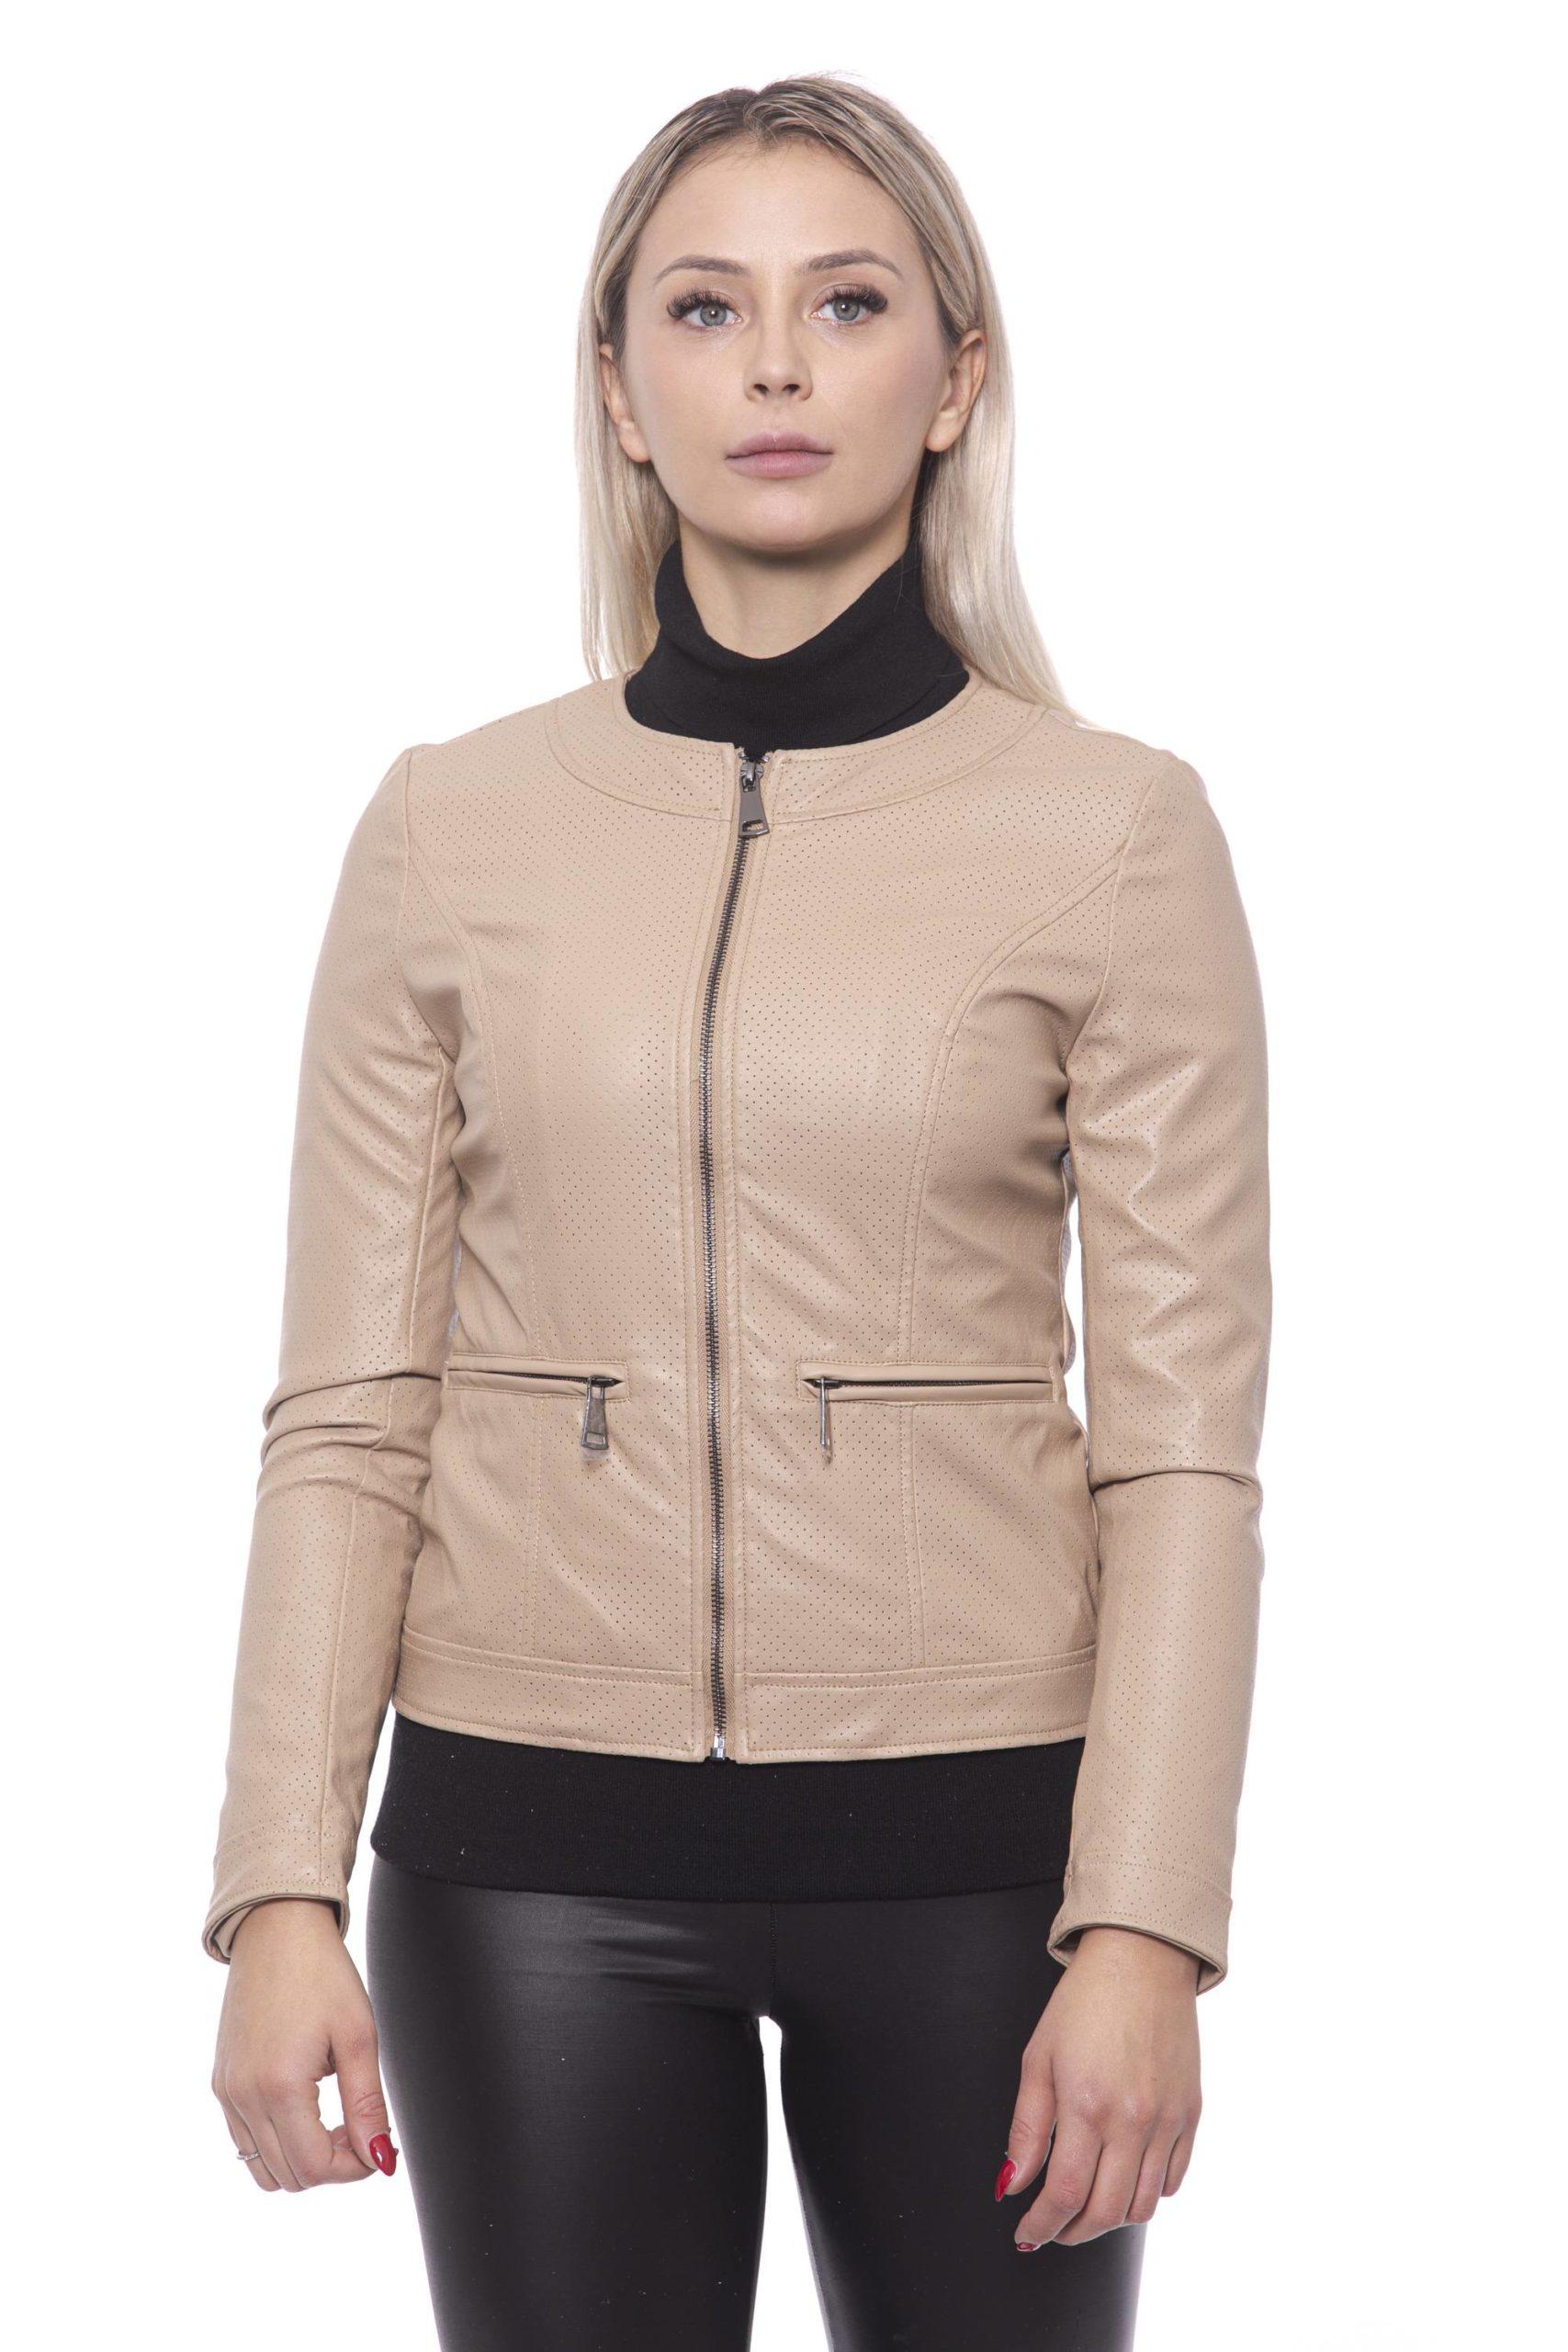 19V69 Italia Women's Jacket Beige 191388269 - M